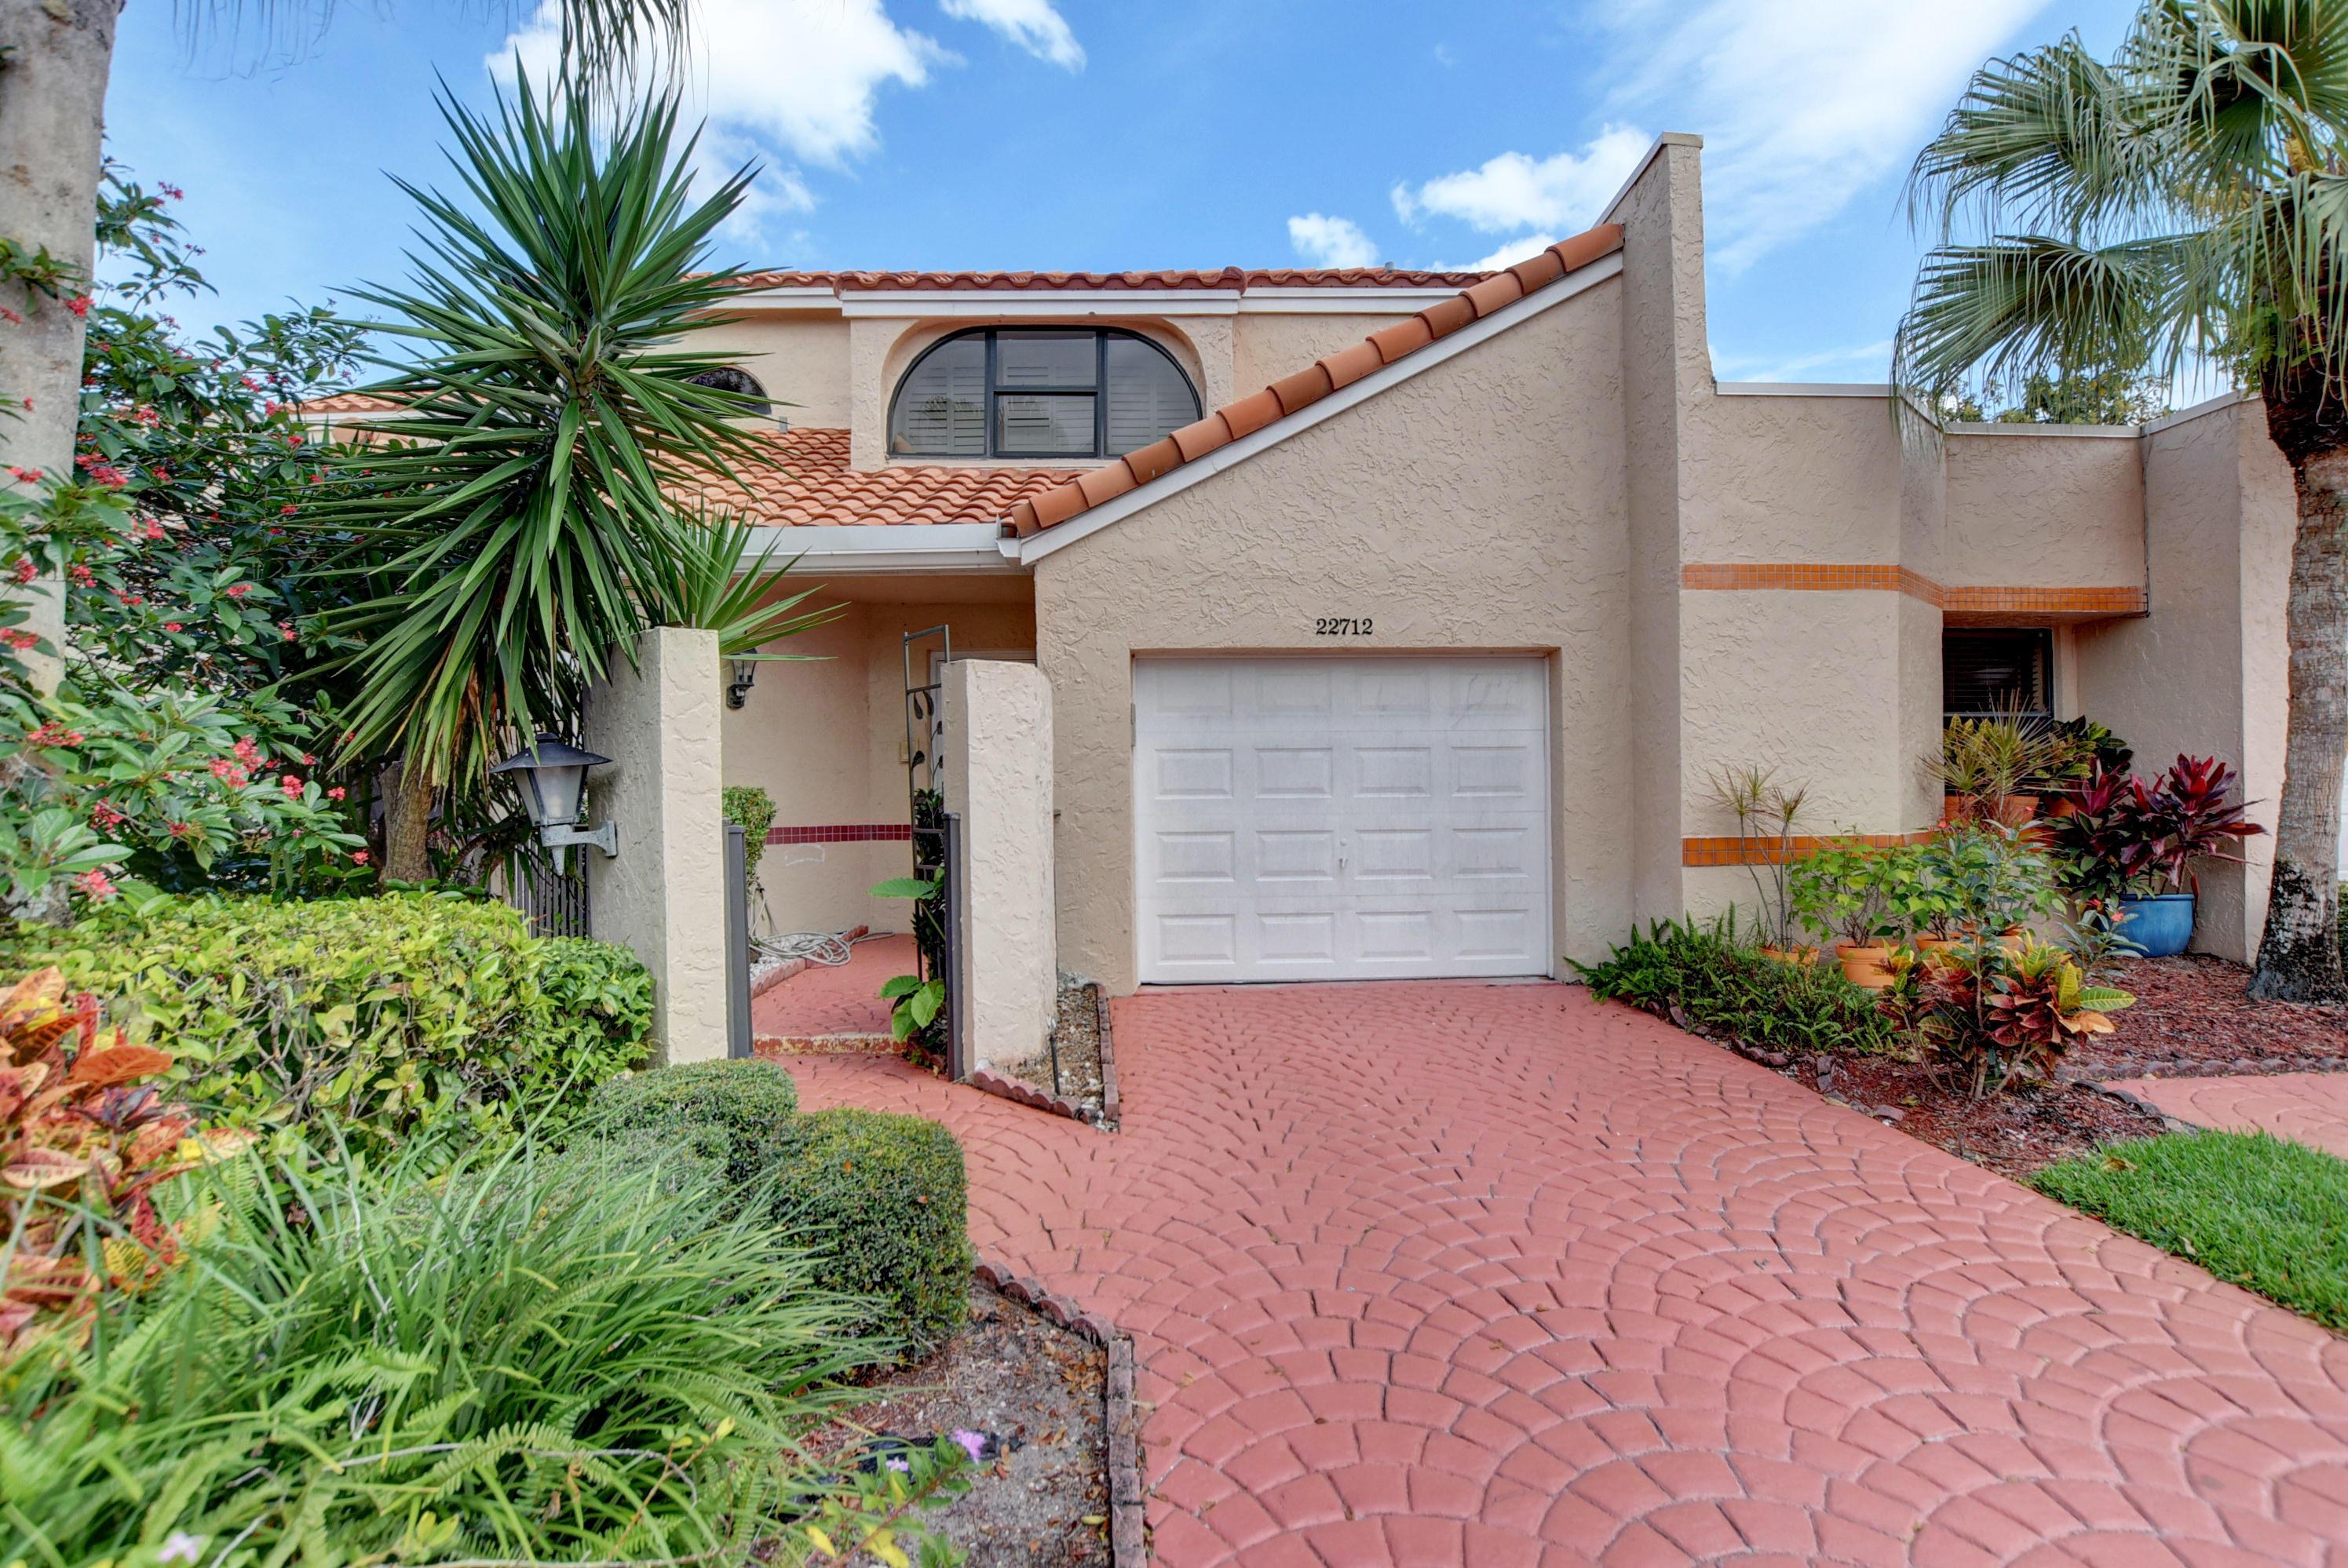 22712 Meridiana Drive Boca Raton, FL 33433